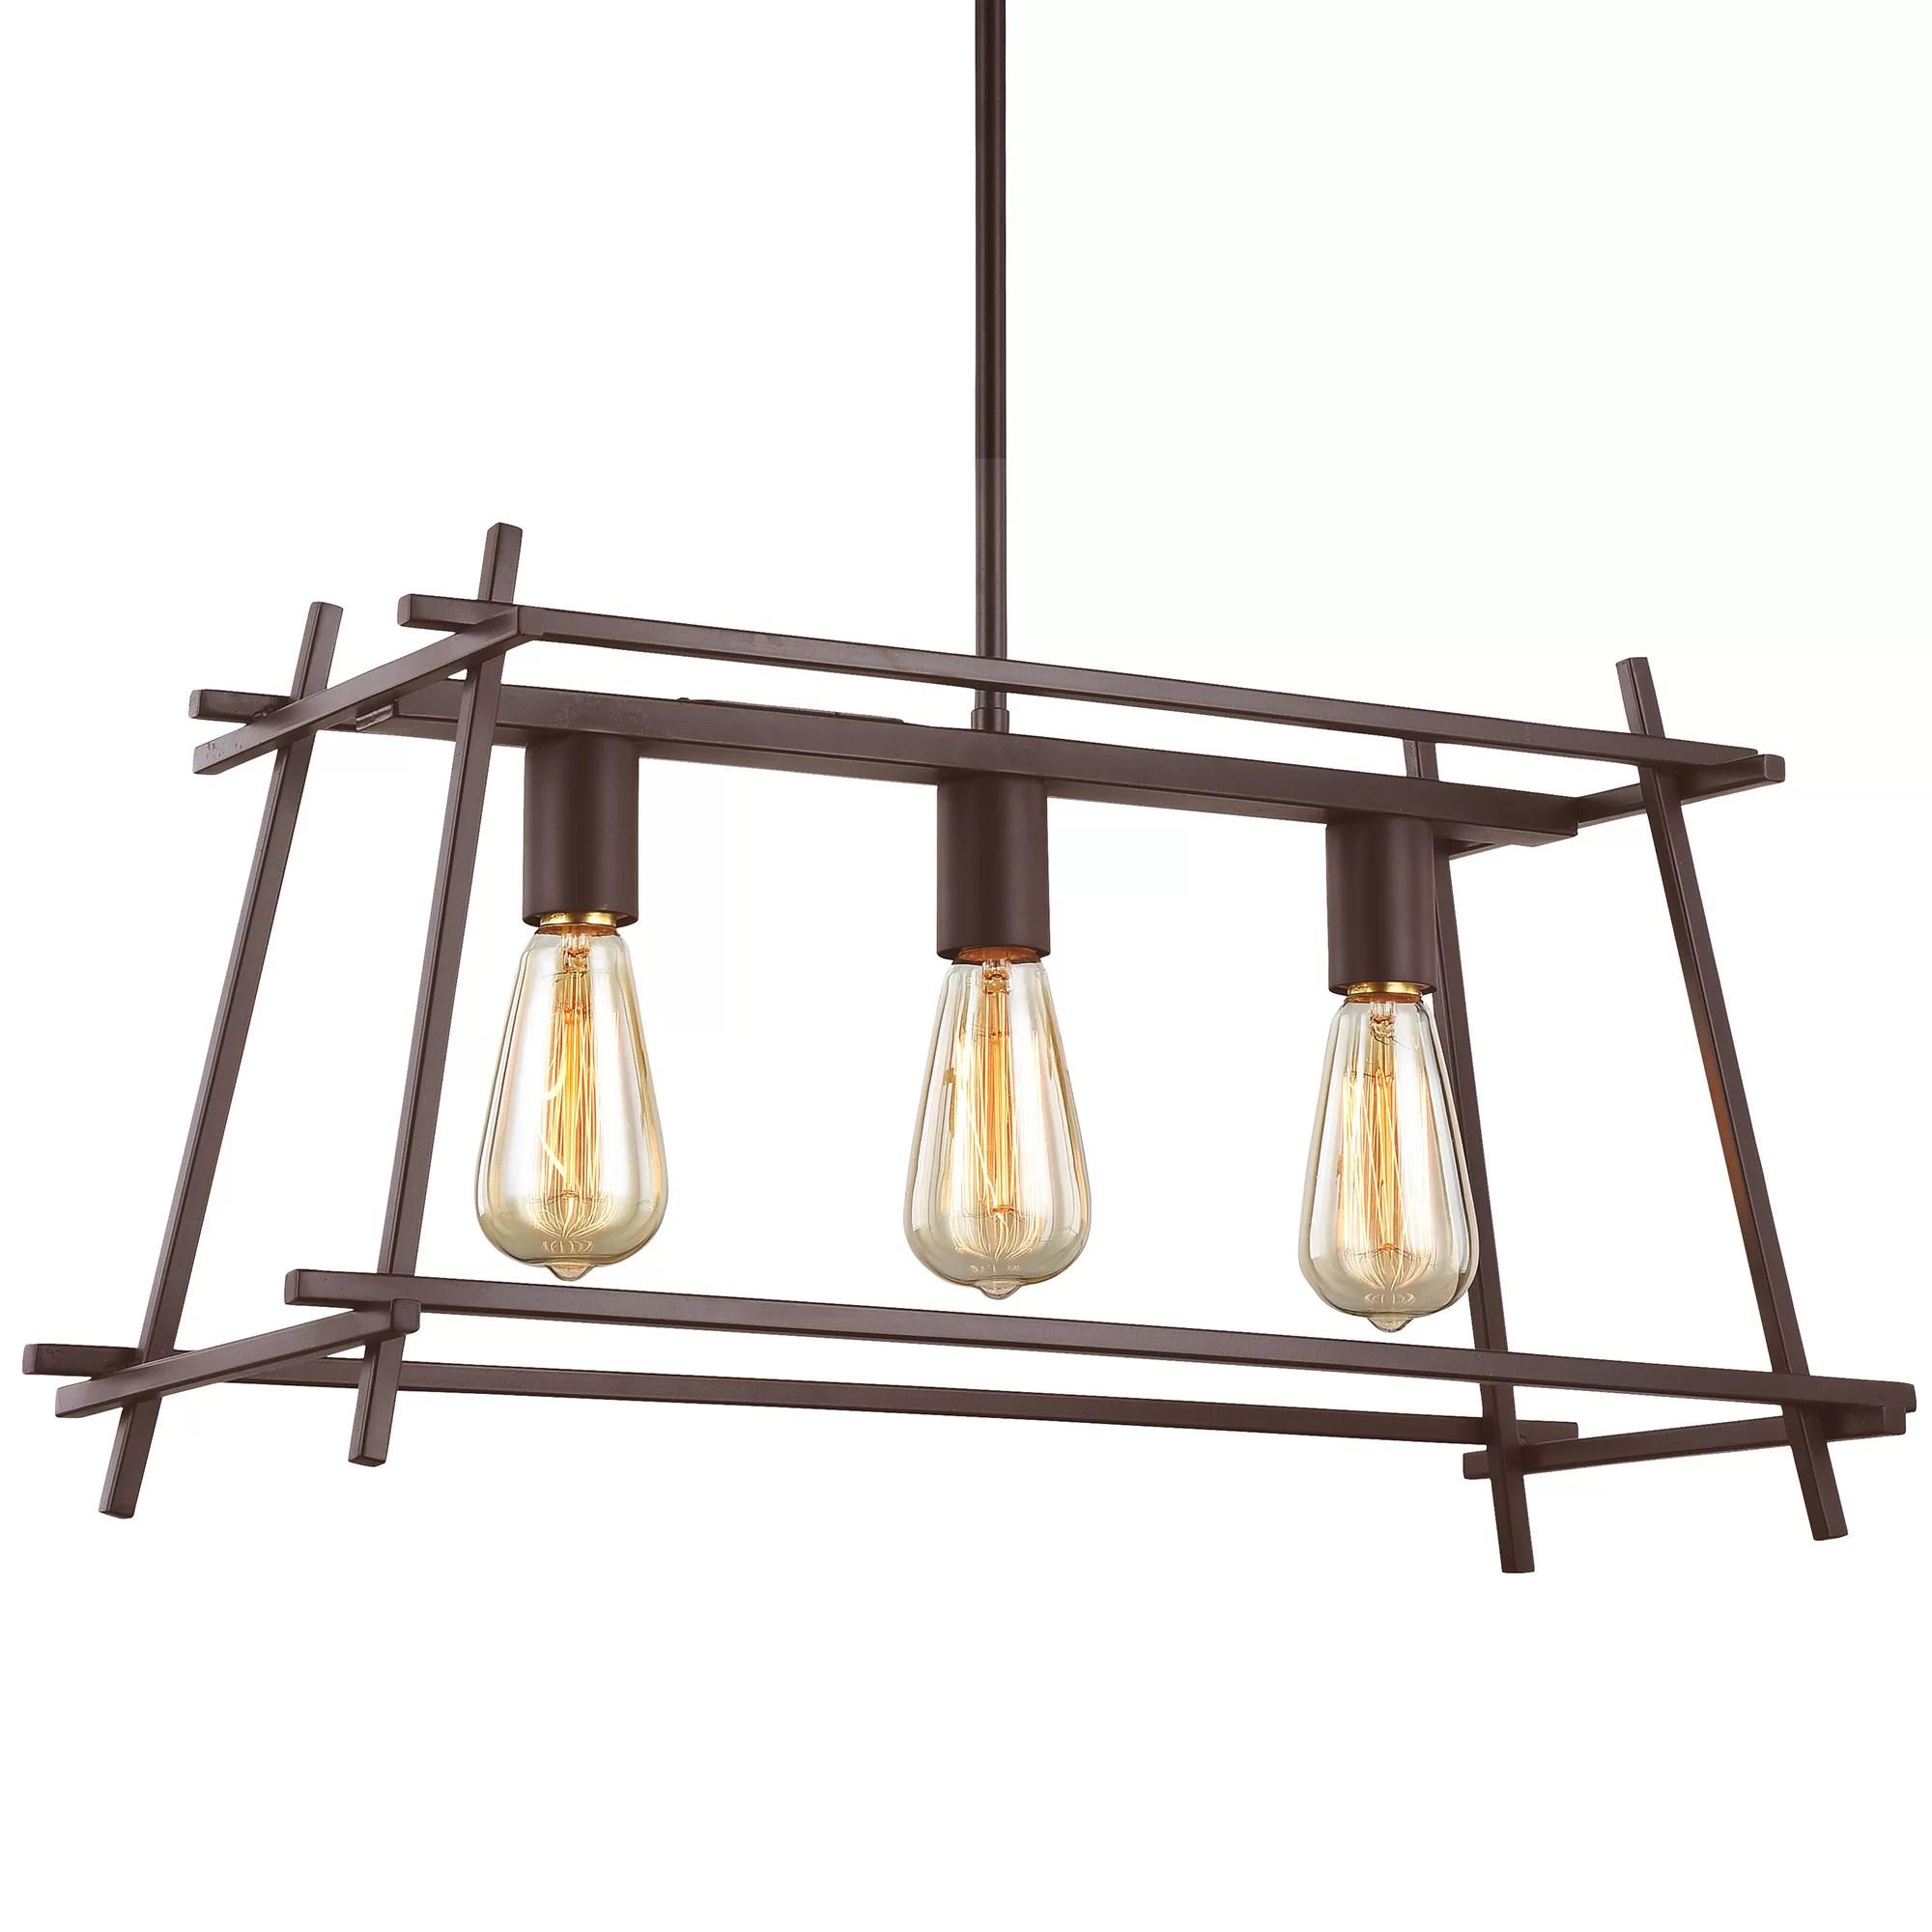 3 light kitchen island pendant cabinets home depot alternating current hashtag